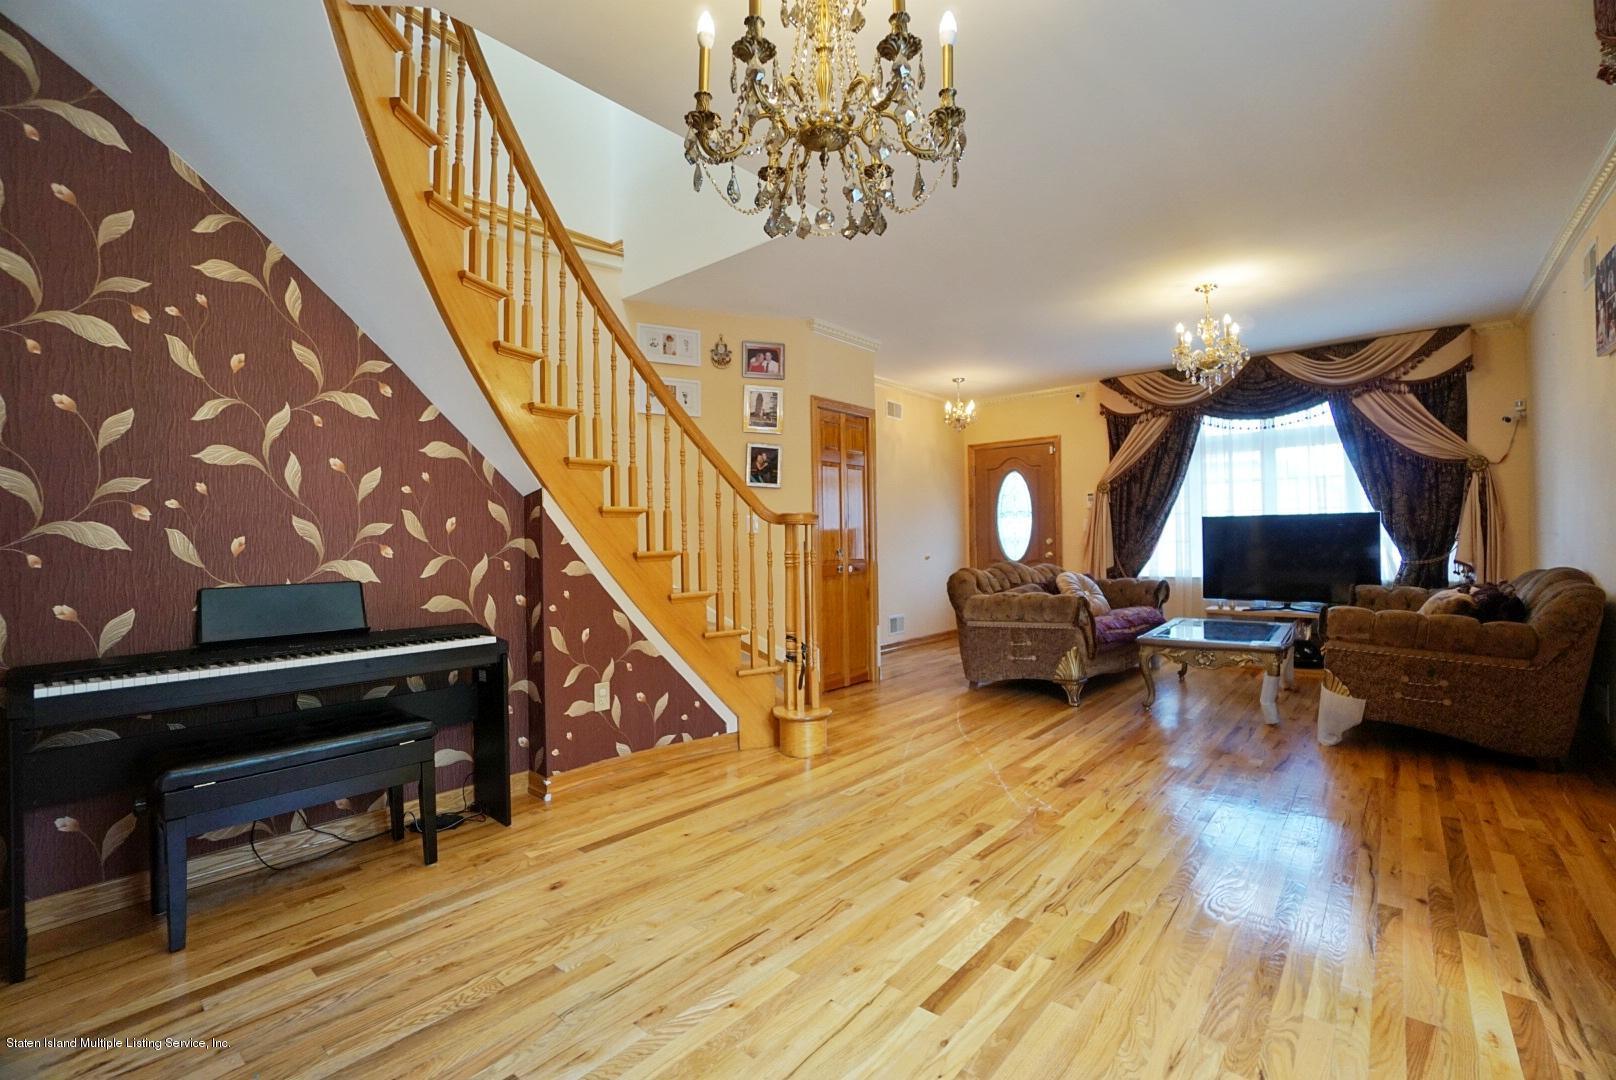 Single Family - Semi-Attached 36 Zwicky Avenue  Staten Island, NY 10306, MLS-1131911-12